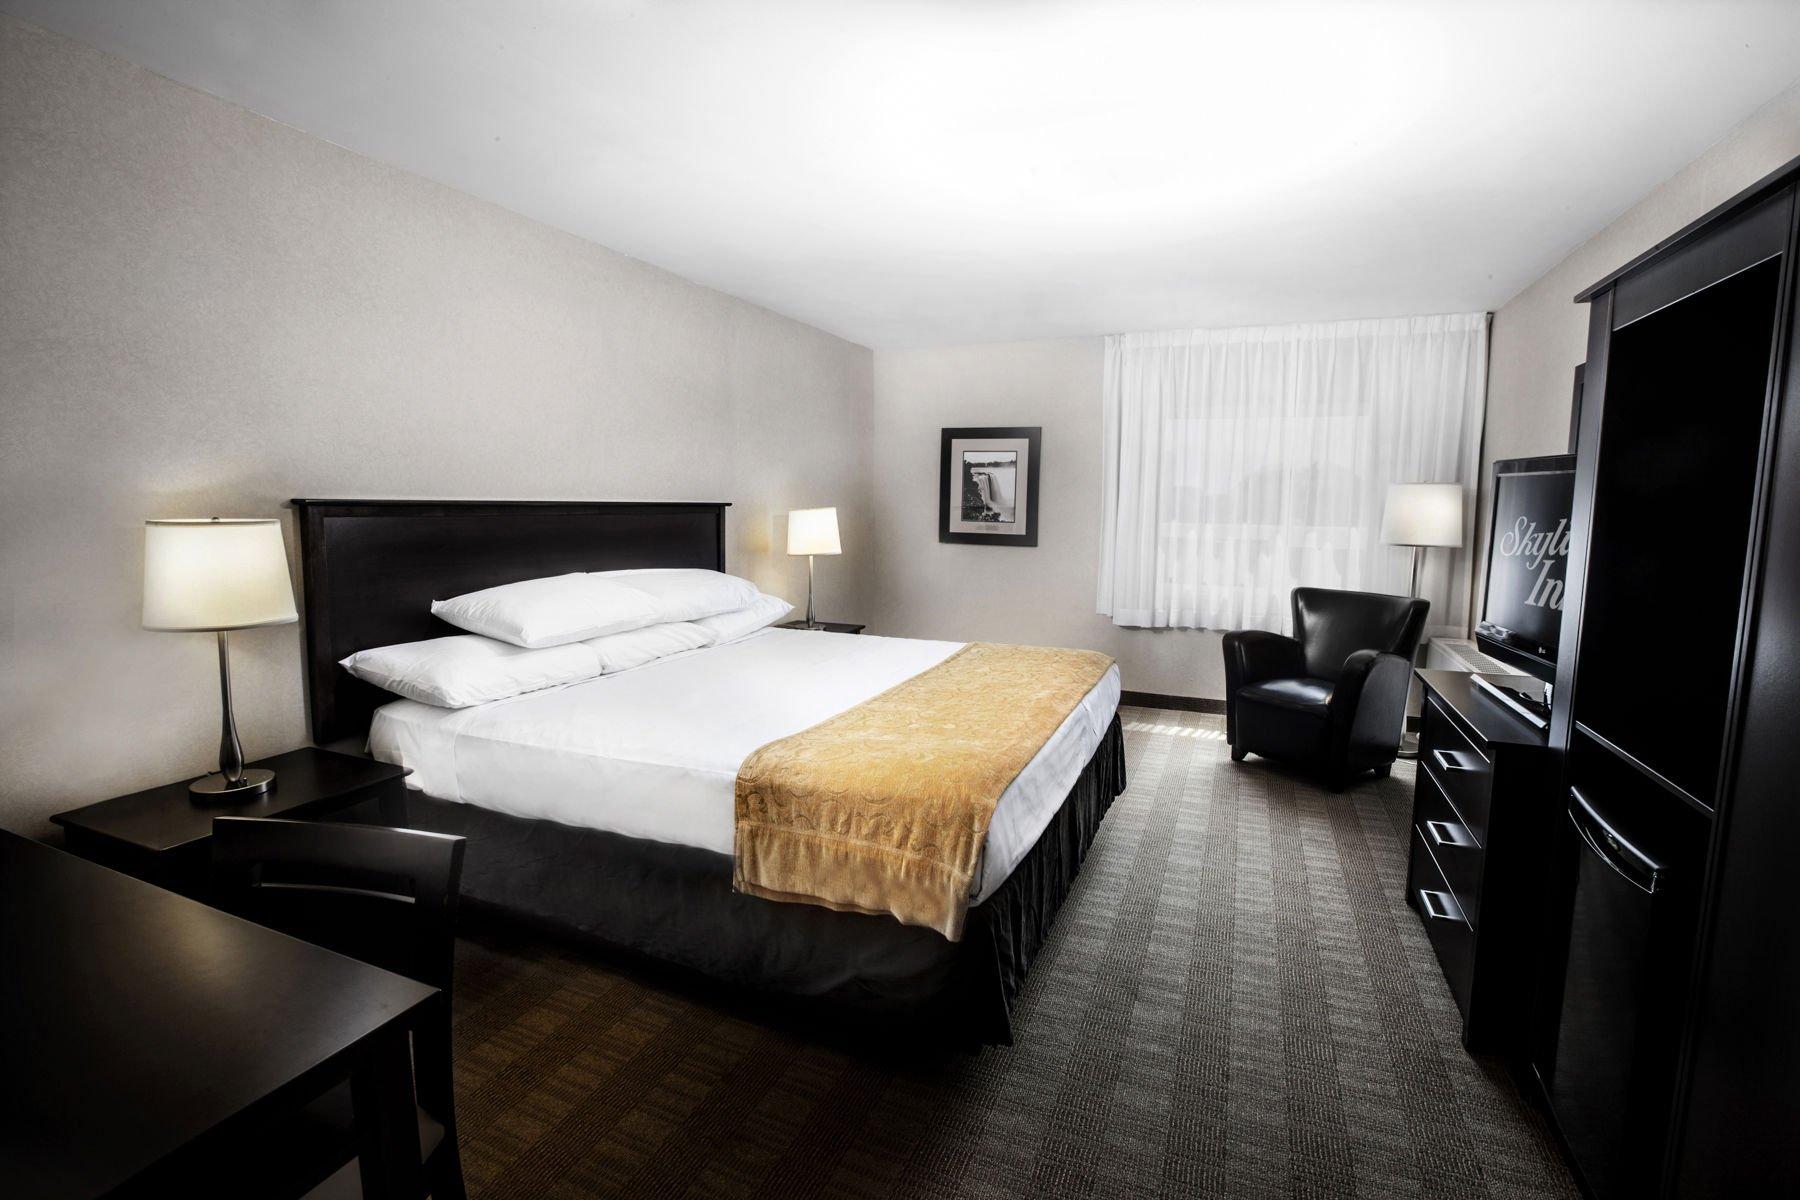 Skyline Hotel Amp Waterpark Where To Stay Niagara Falls